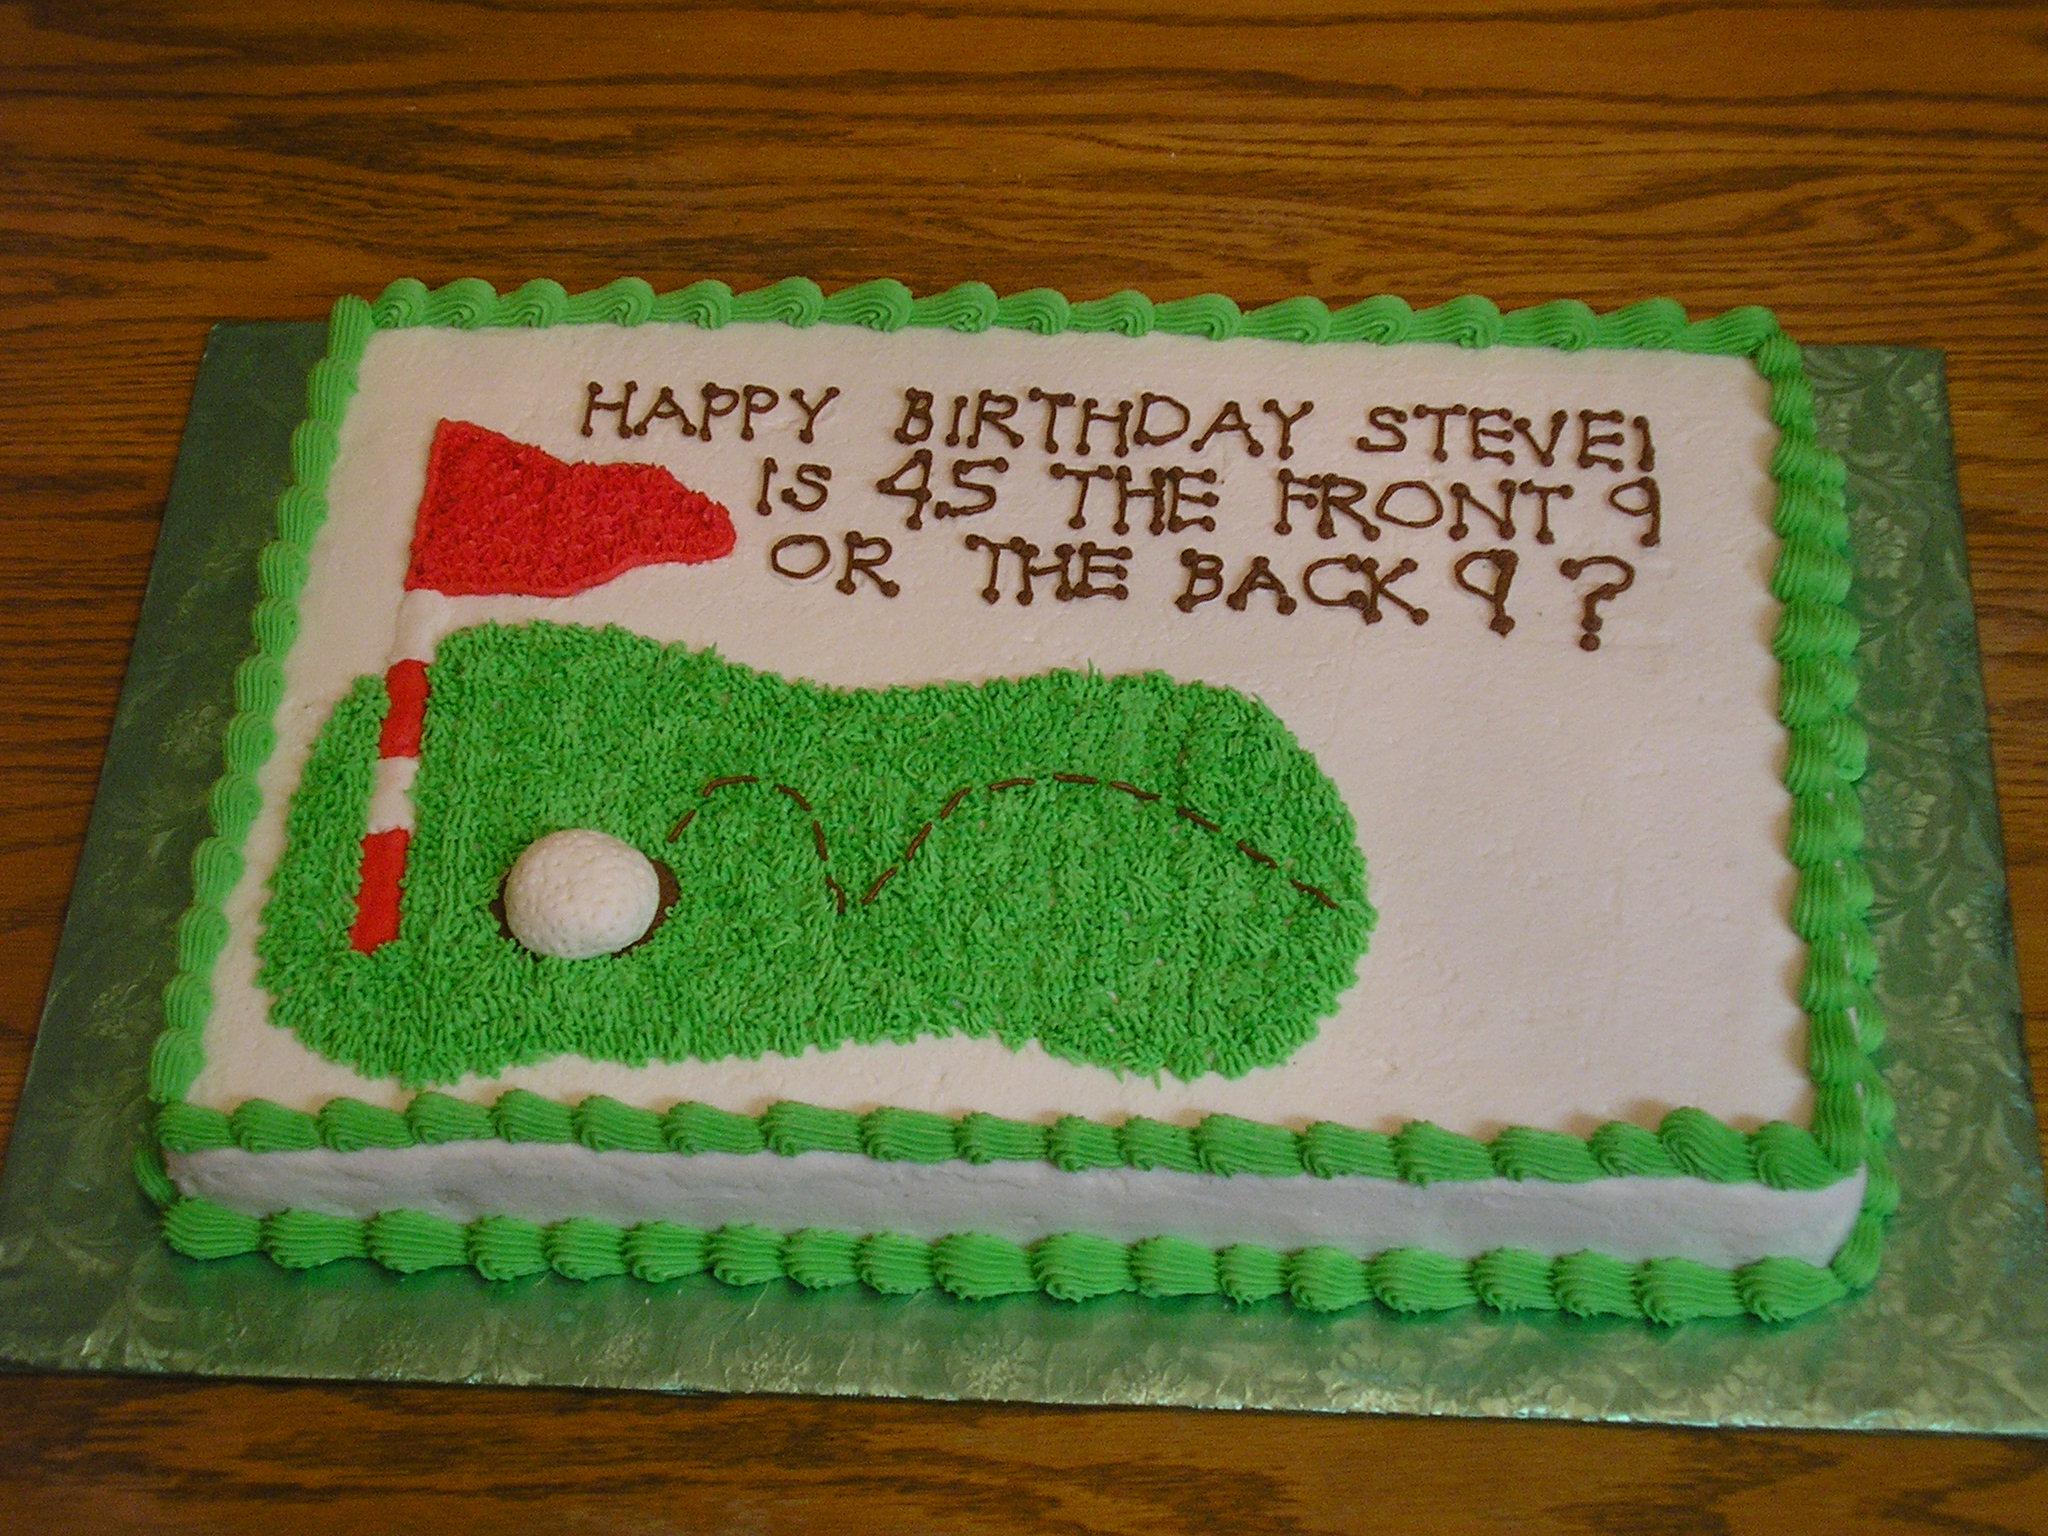 Prime 10 Funny Golf 50Th Birthday Cakes Photo Man 50Th Birthday Cake Personalised Birthday Cards Veneteletsinfo